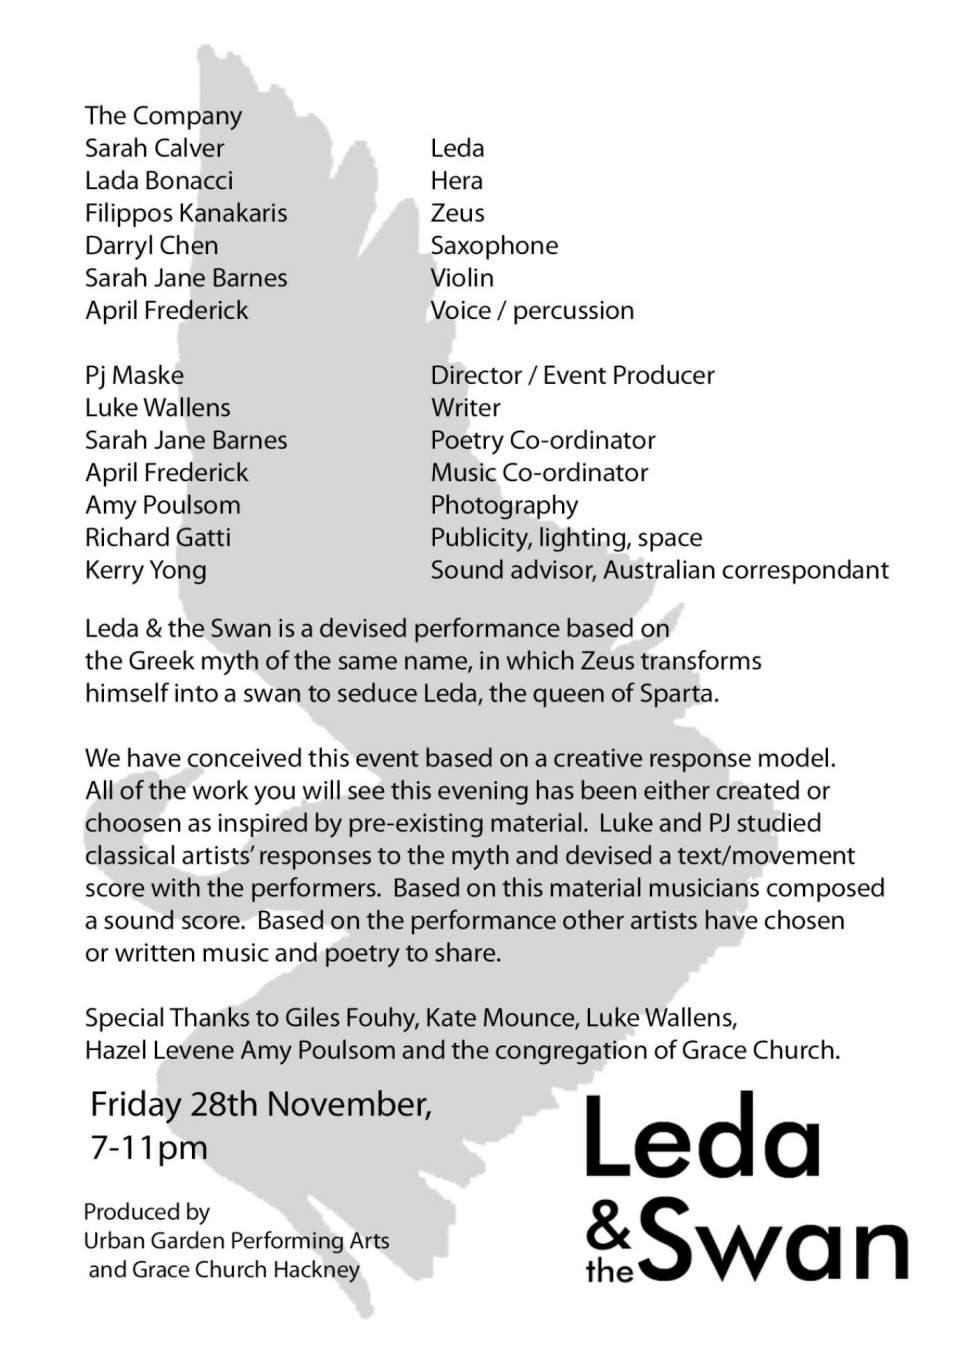 Leda & the Swan - Program